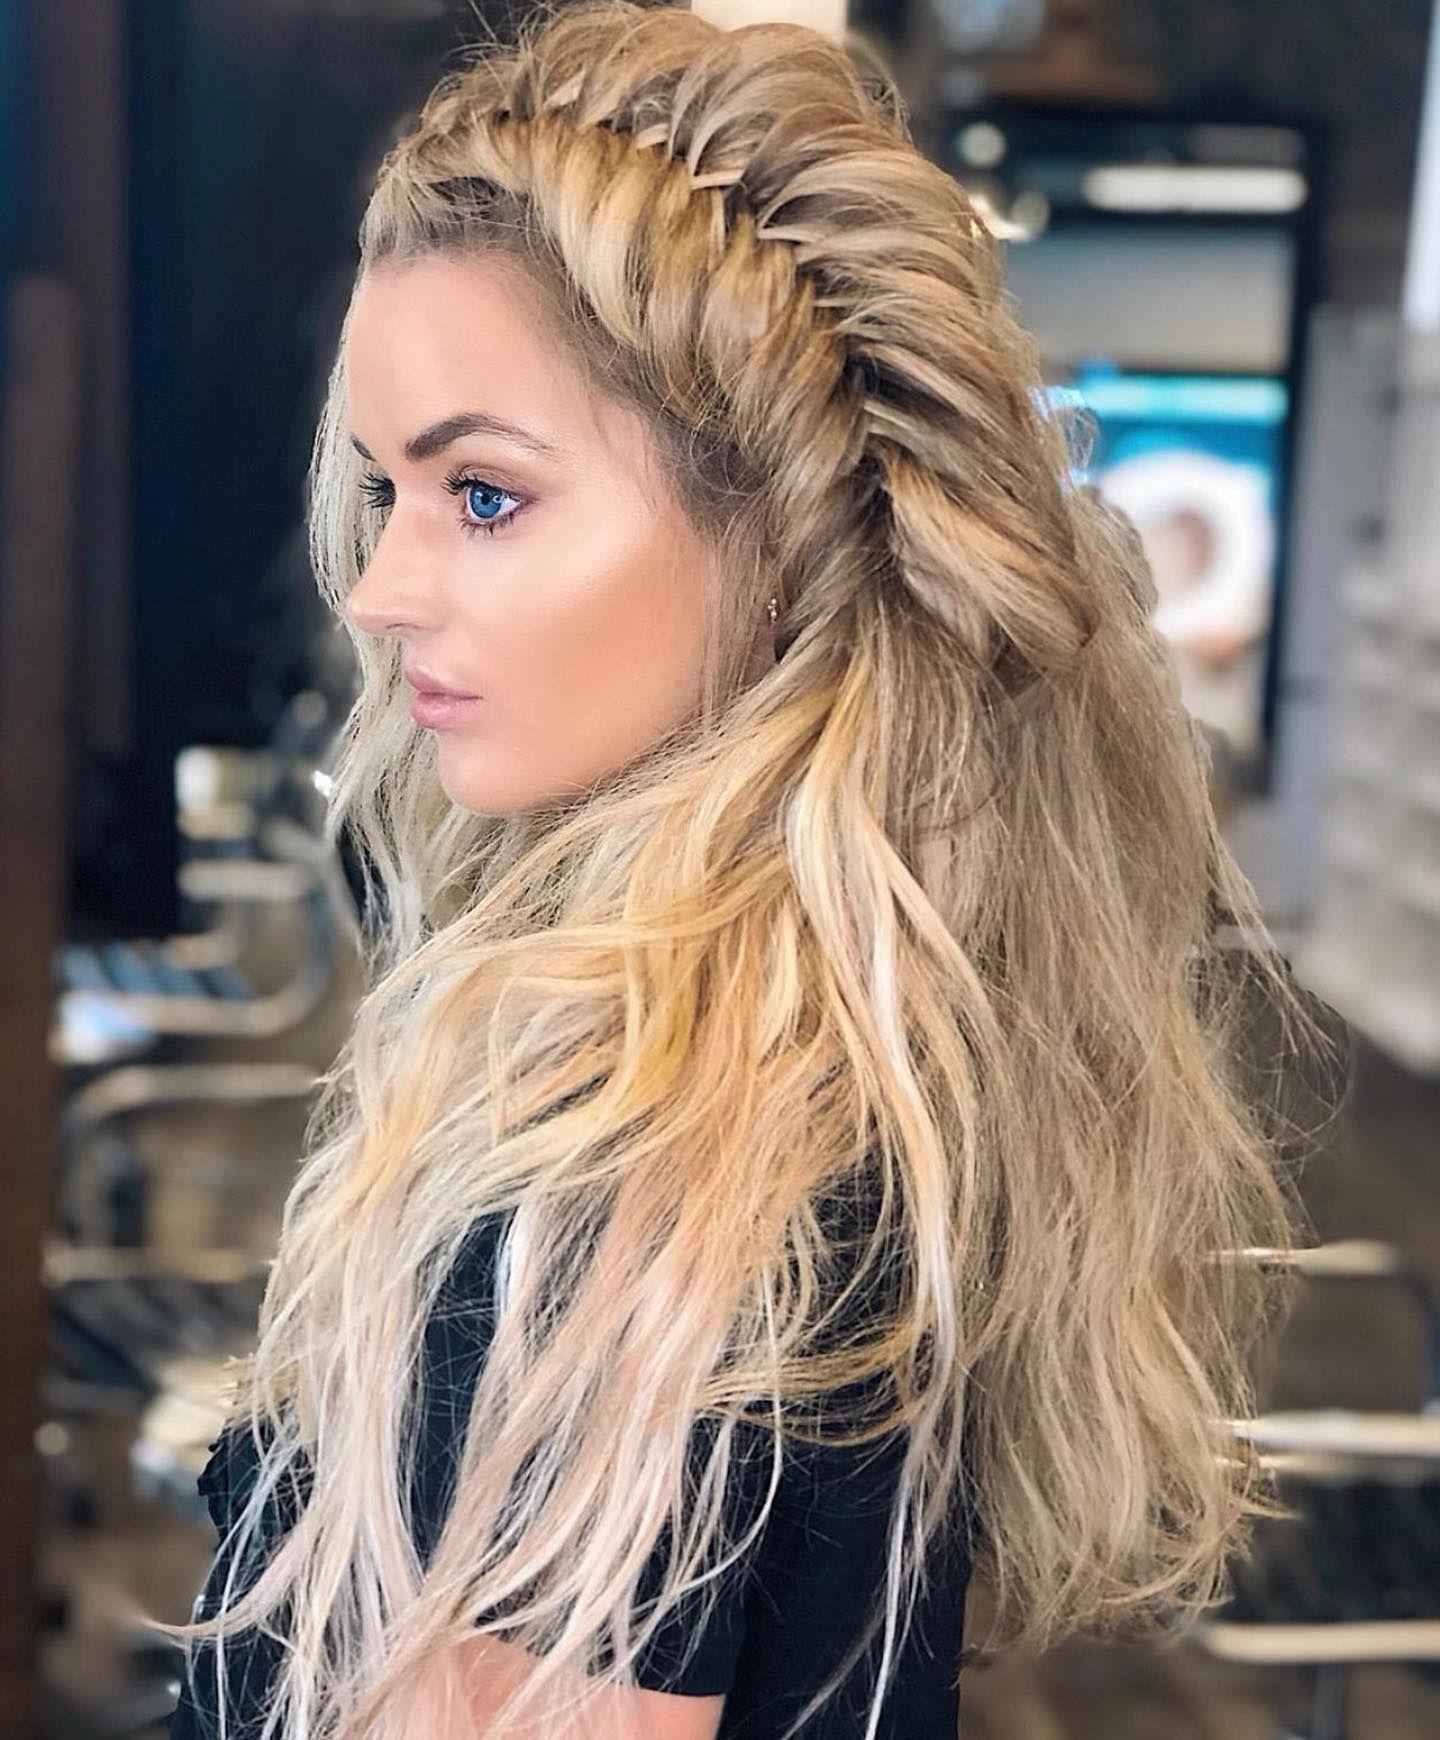 Braid Goals By Sophiemaggie Black Friday Flash Deal All Clip In Plaits Now 4 99 Don T Hair Rehab London Hair Piece Hair Pieces